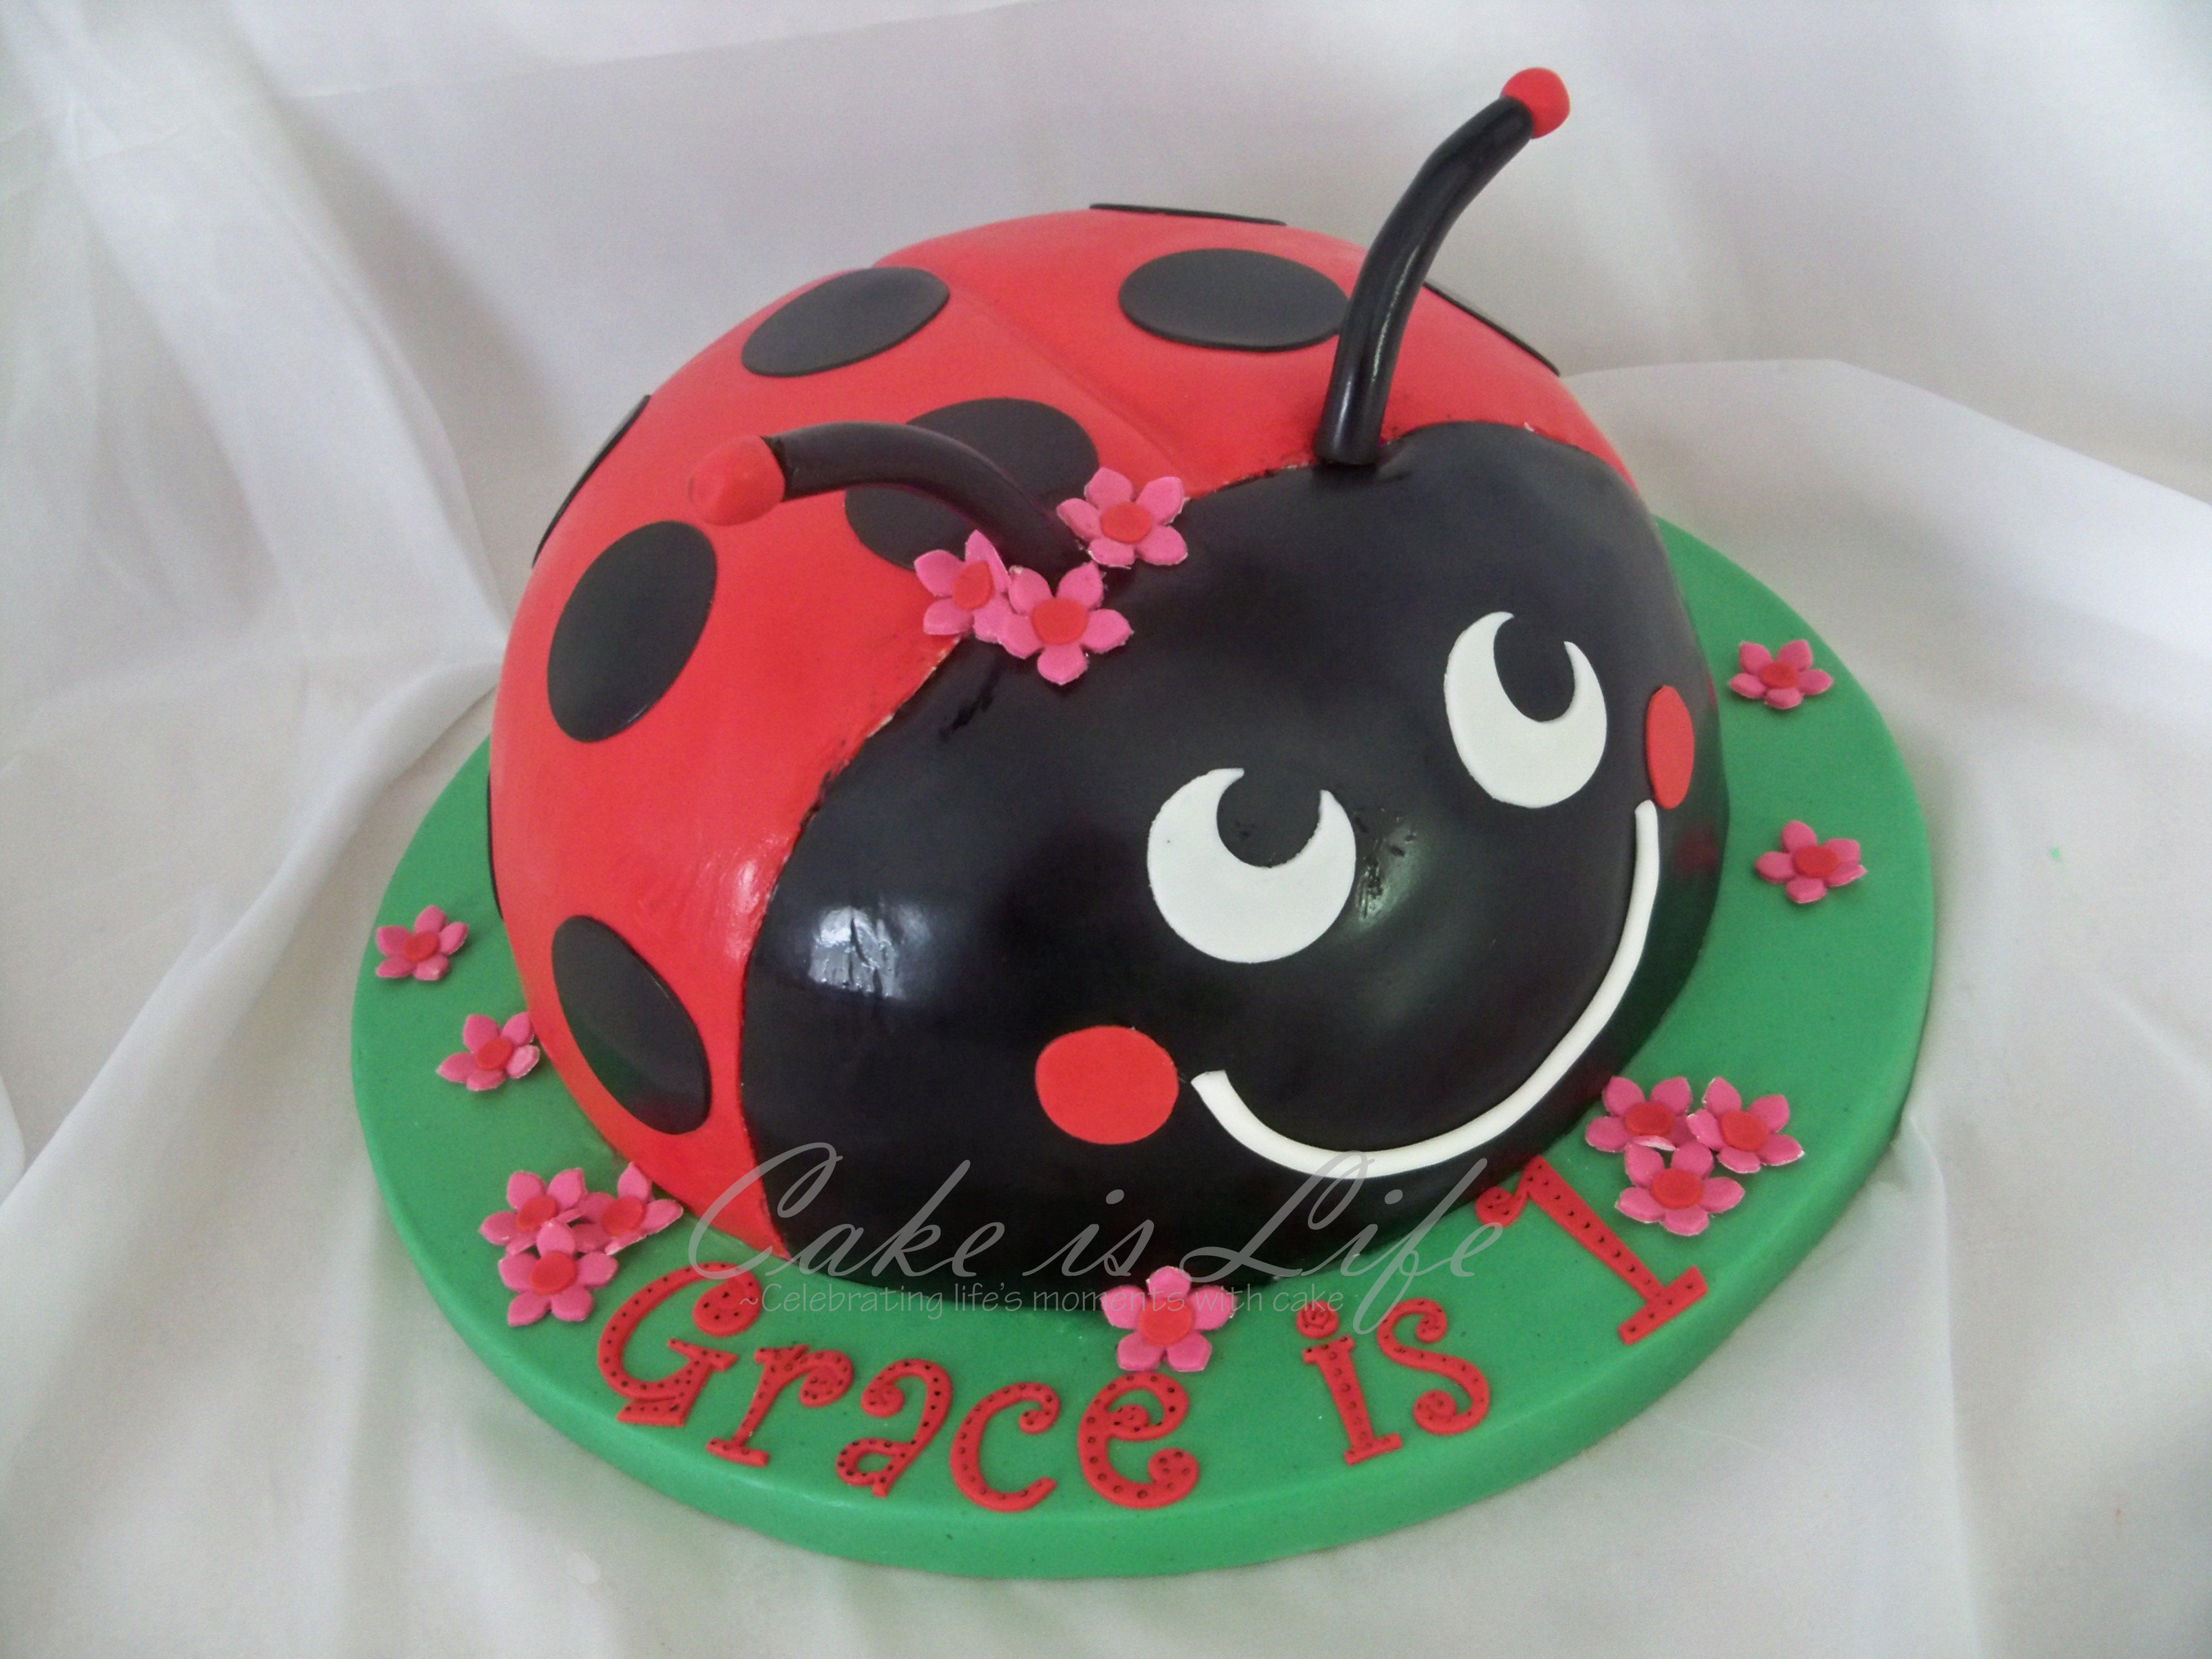 Best ideas about Ladybug Birthday Cake . Save or Pin Ladybug Birthday Cake Now.